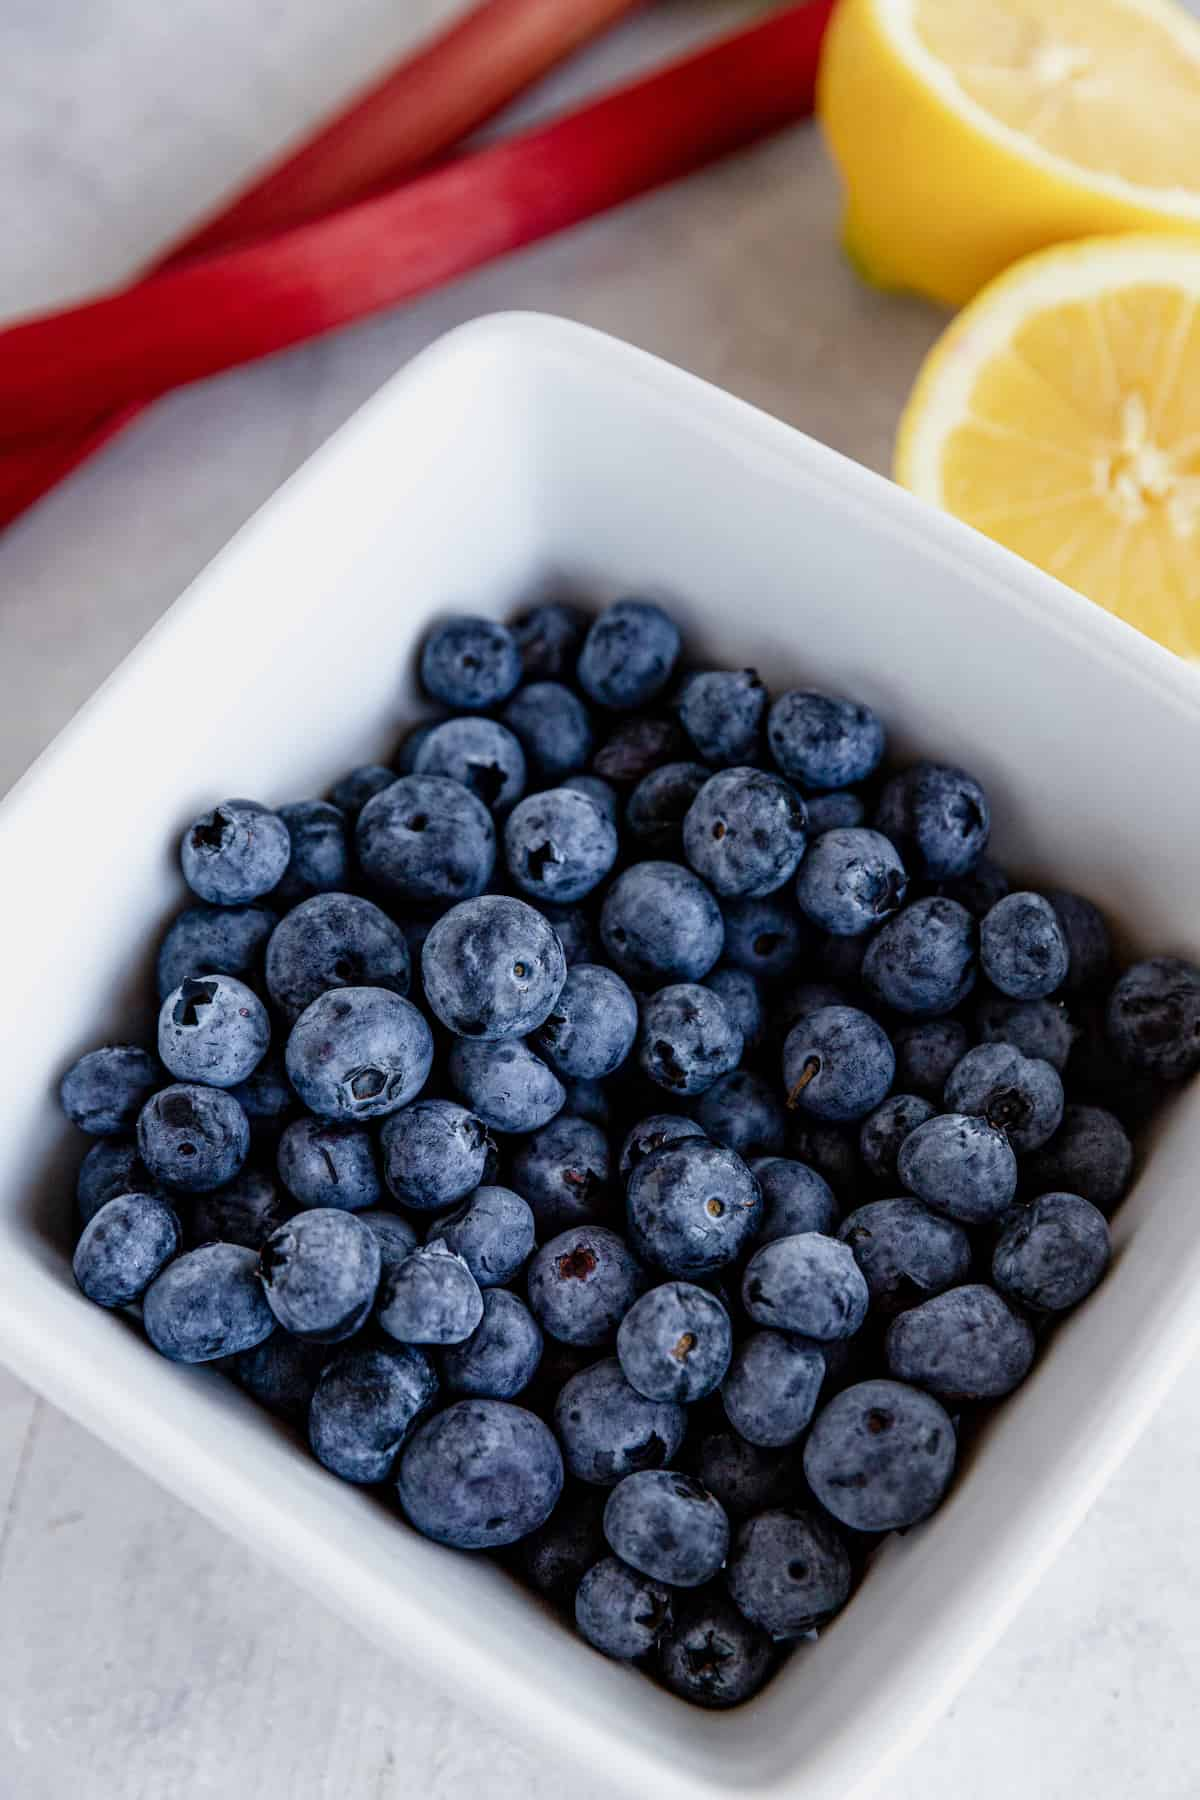 A Bowl of Blueberries Beside Rhubarb and a Fresh Lemon Cut in Half